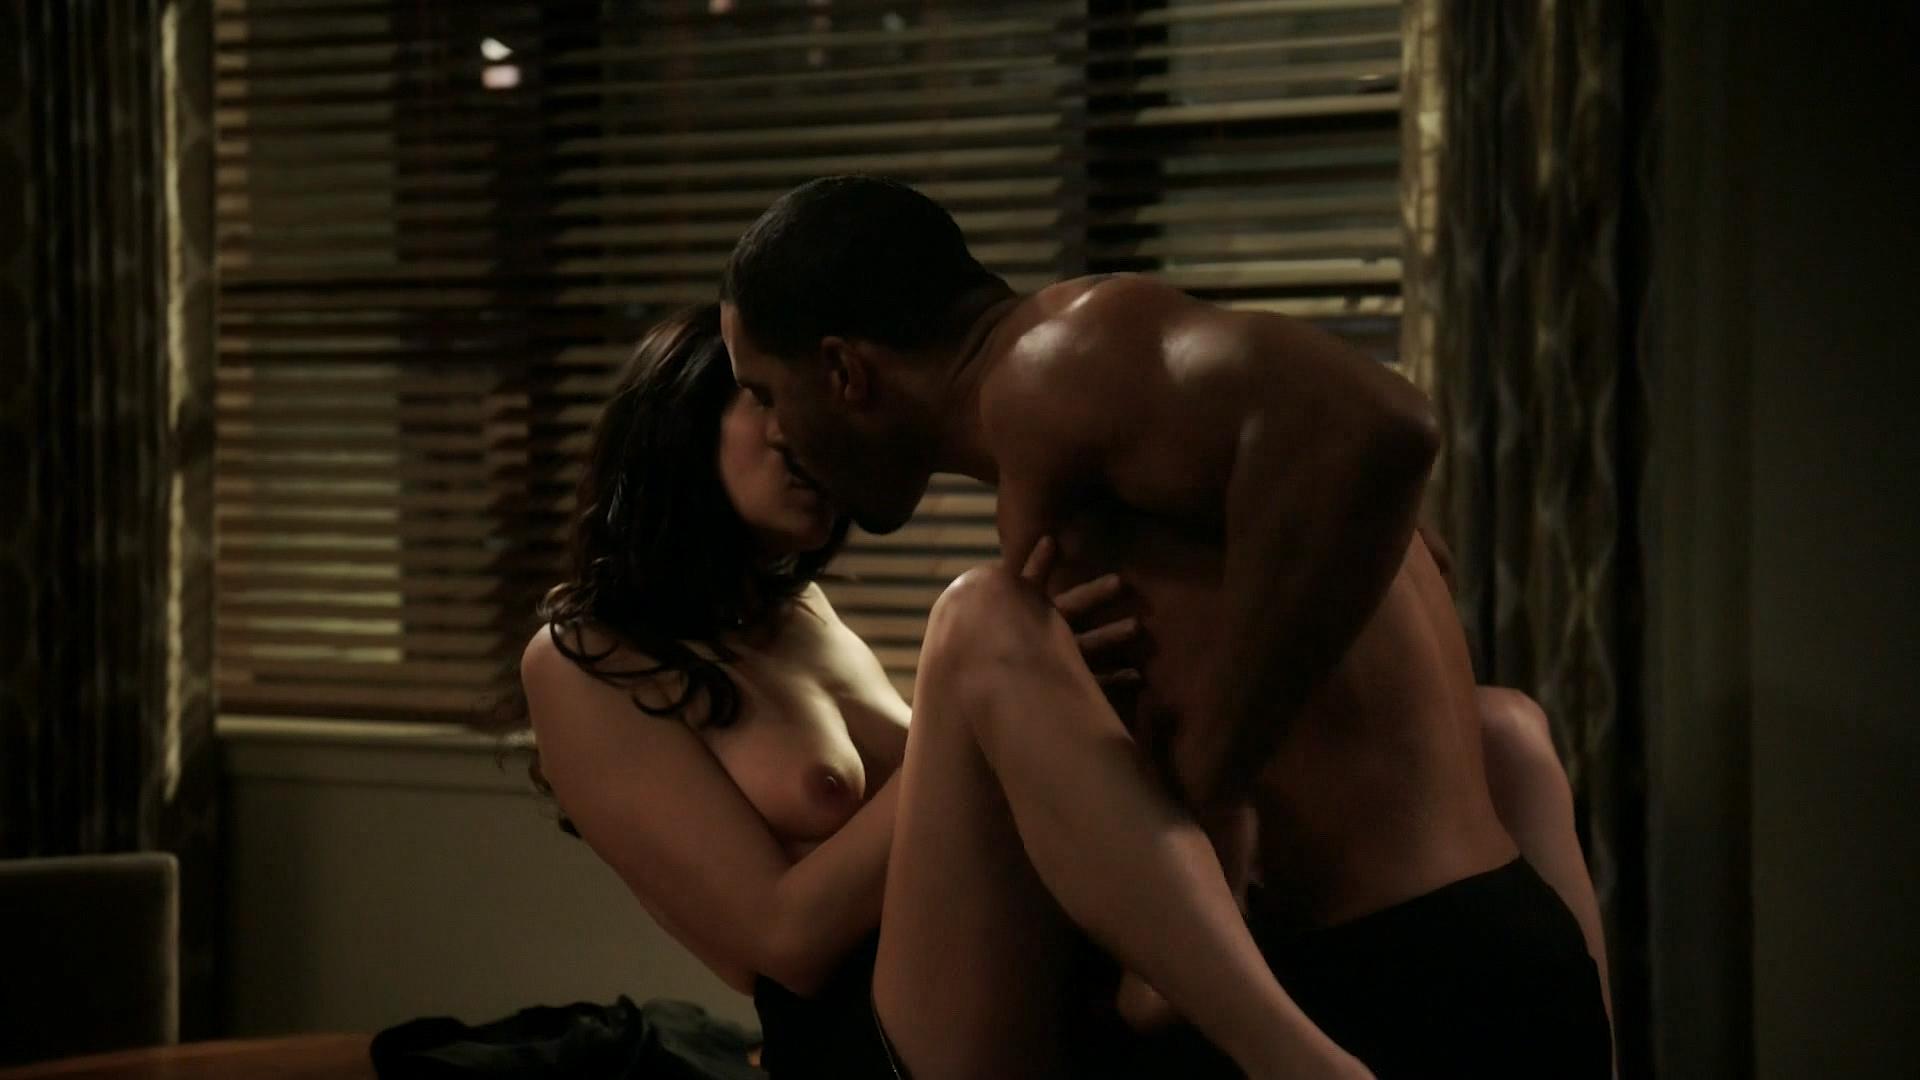 Lela loren nude sex scene on power